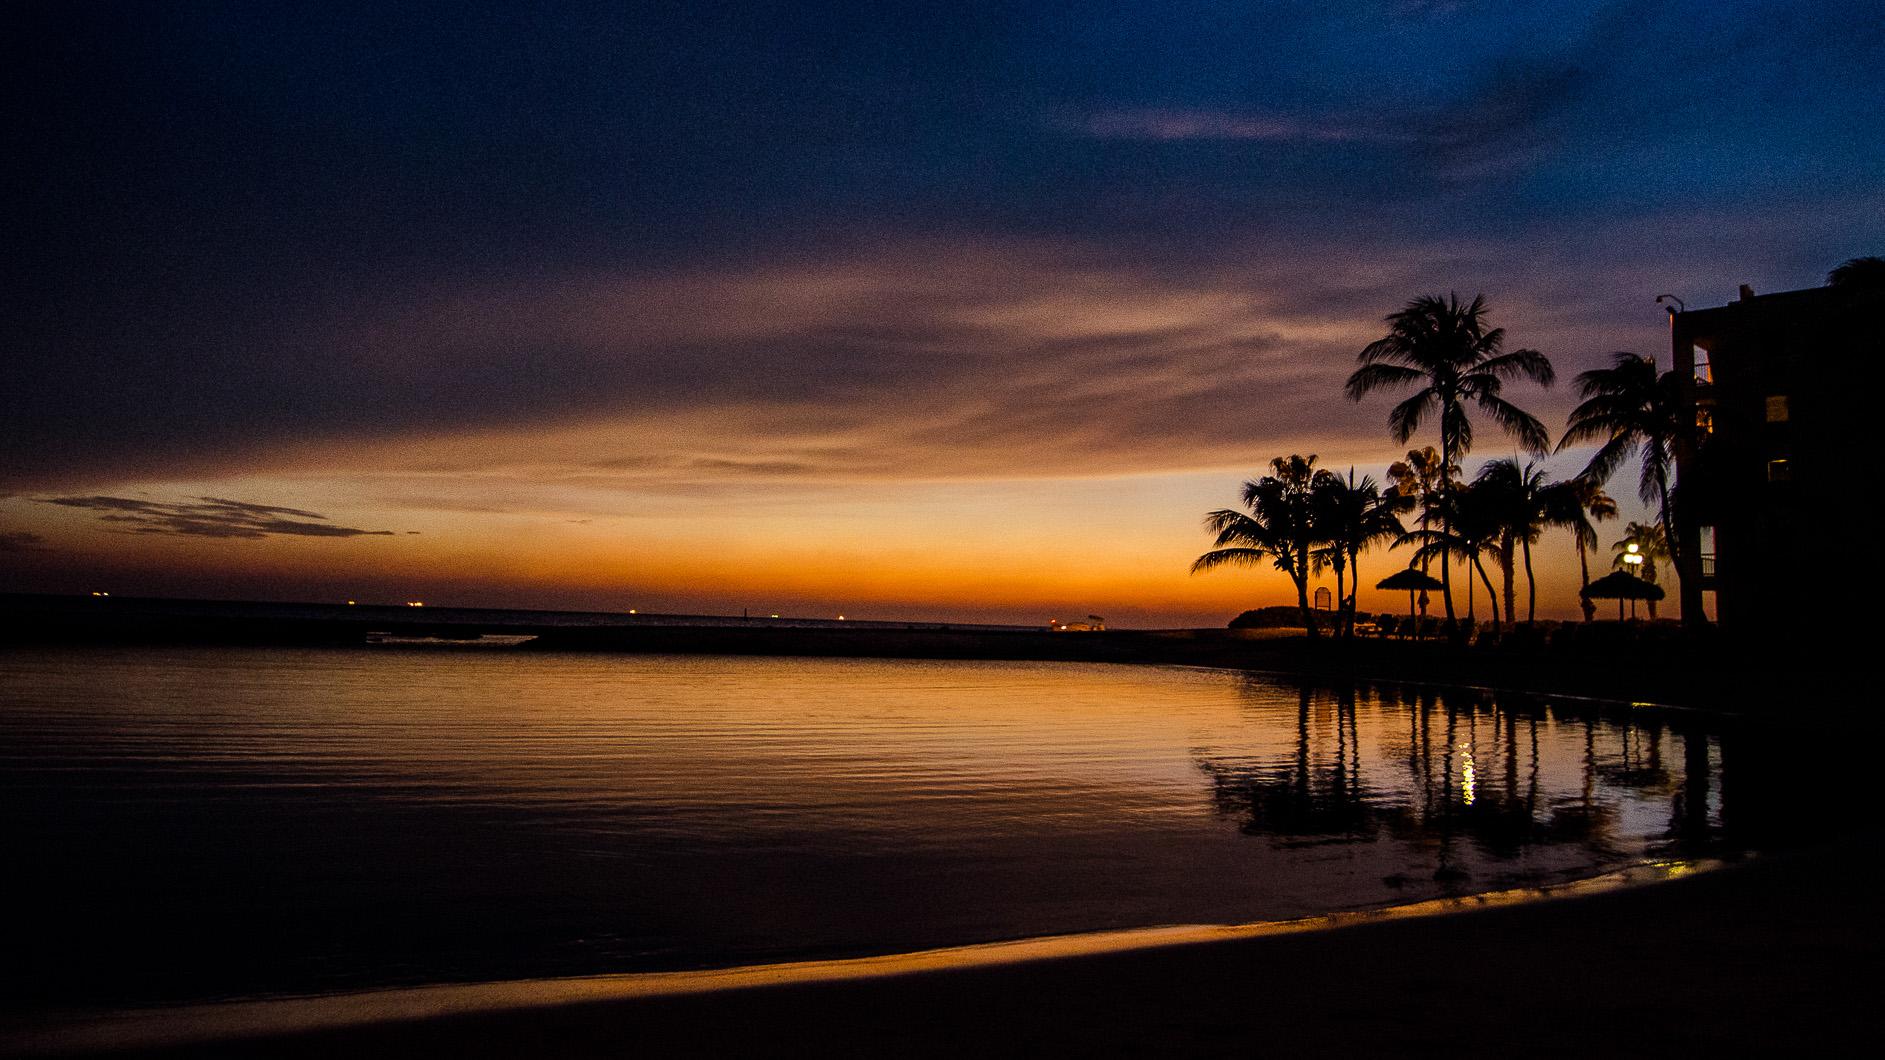 Sunset on Aruba - by Higor de Padua Vieira Neto